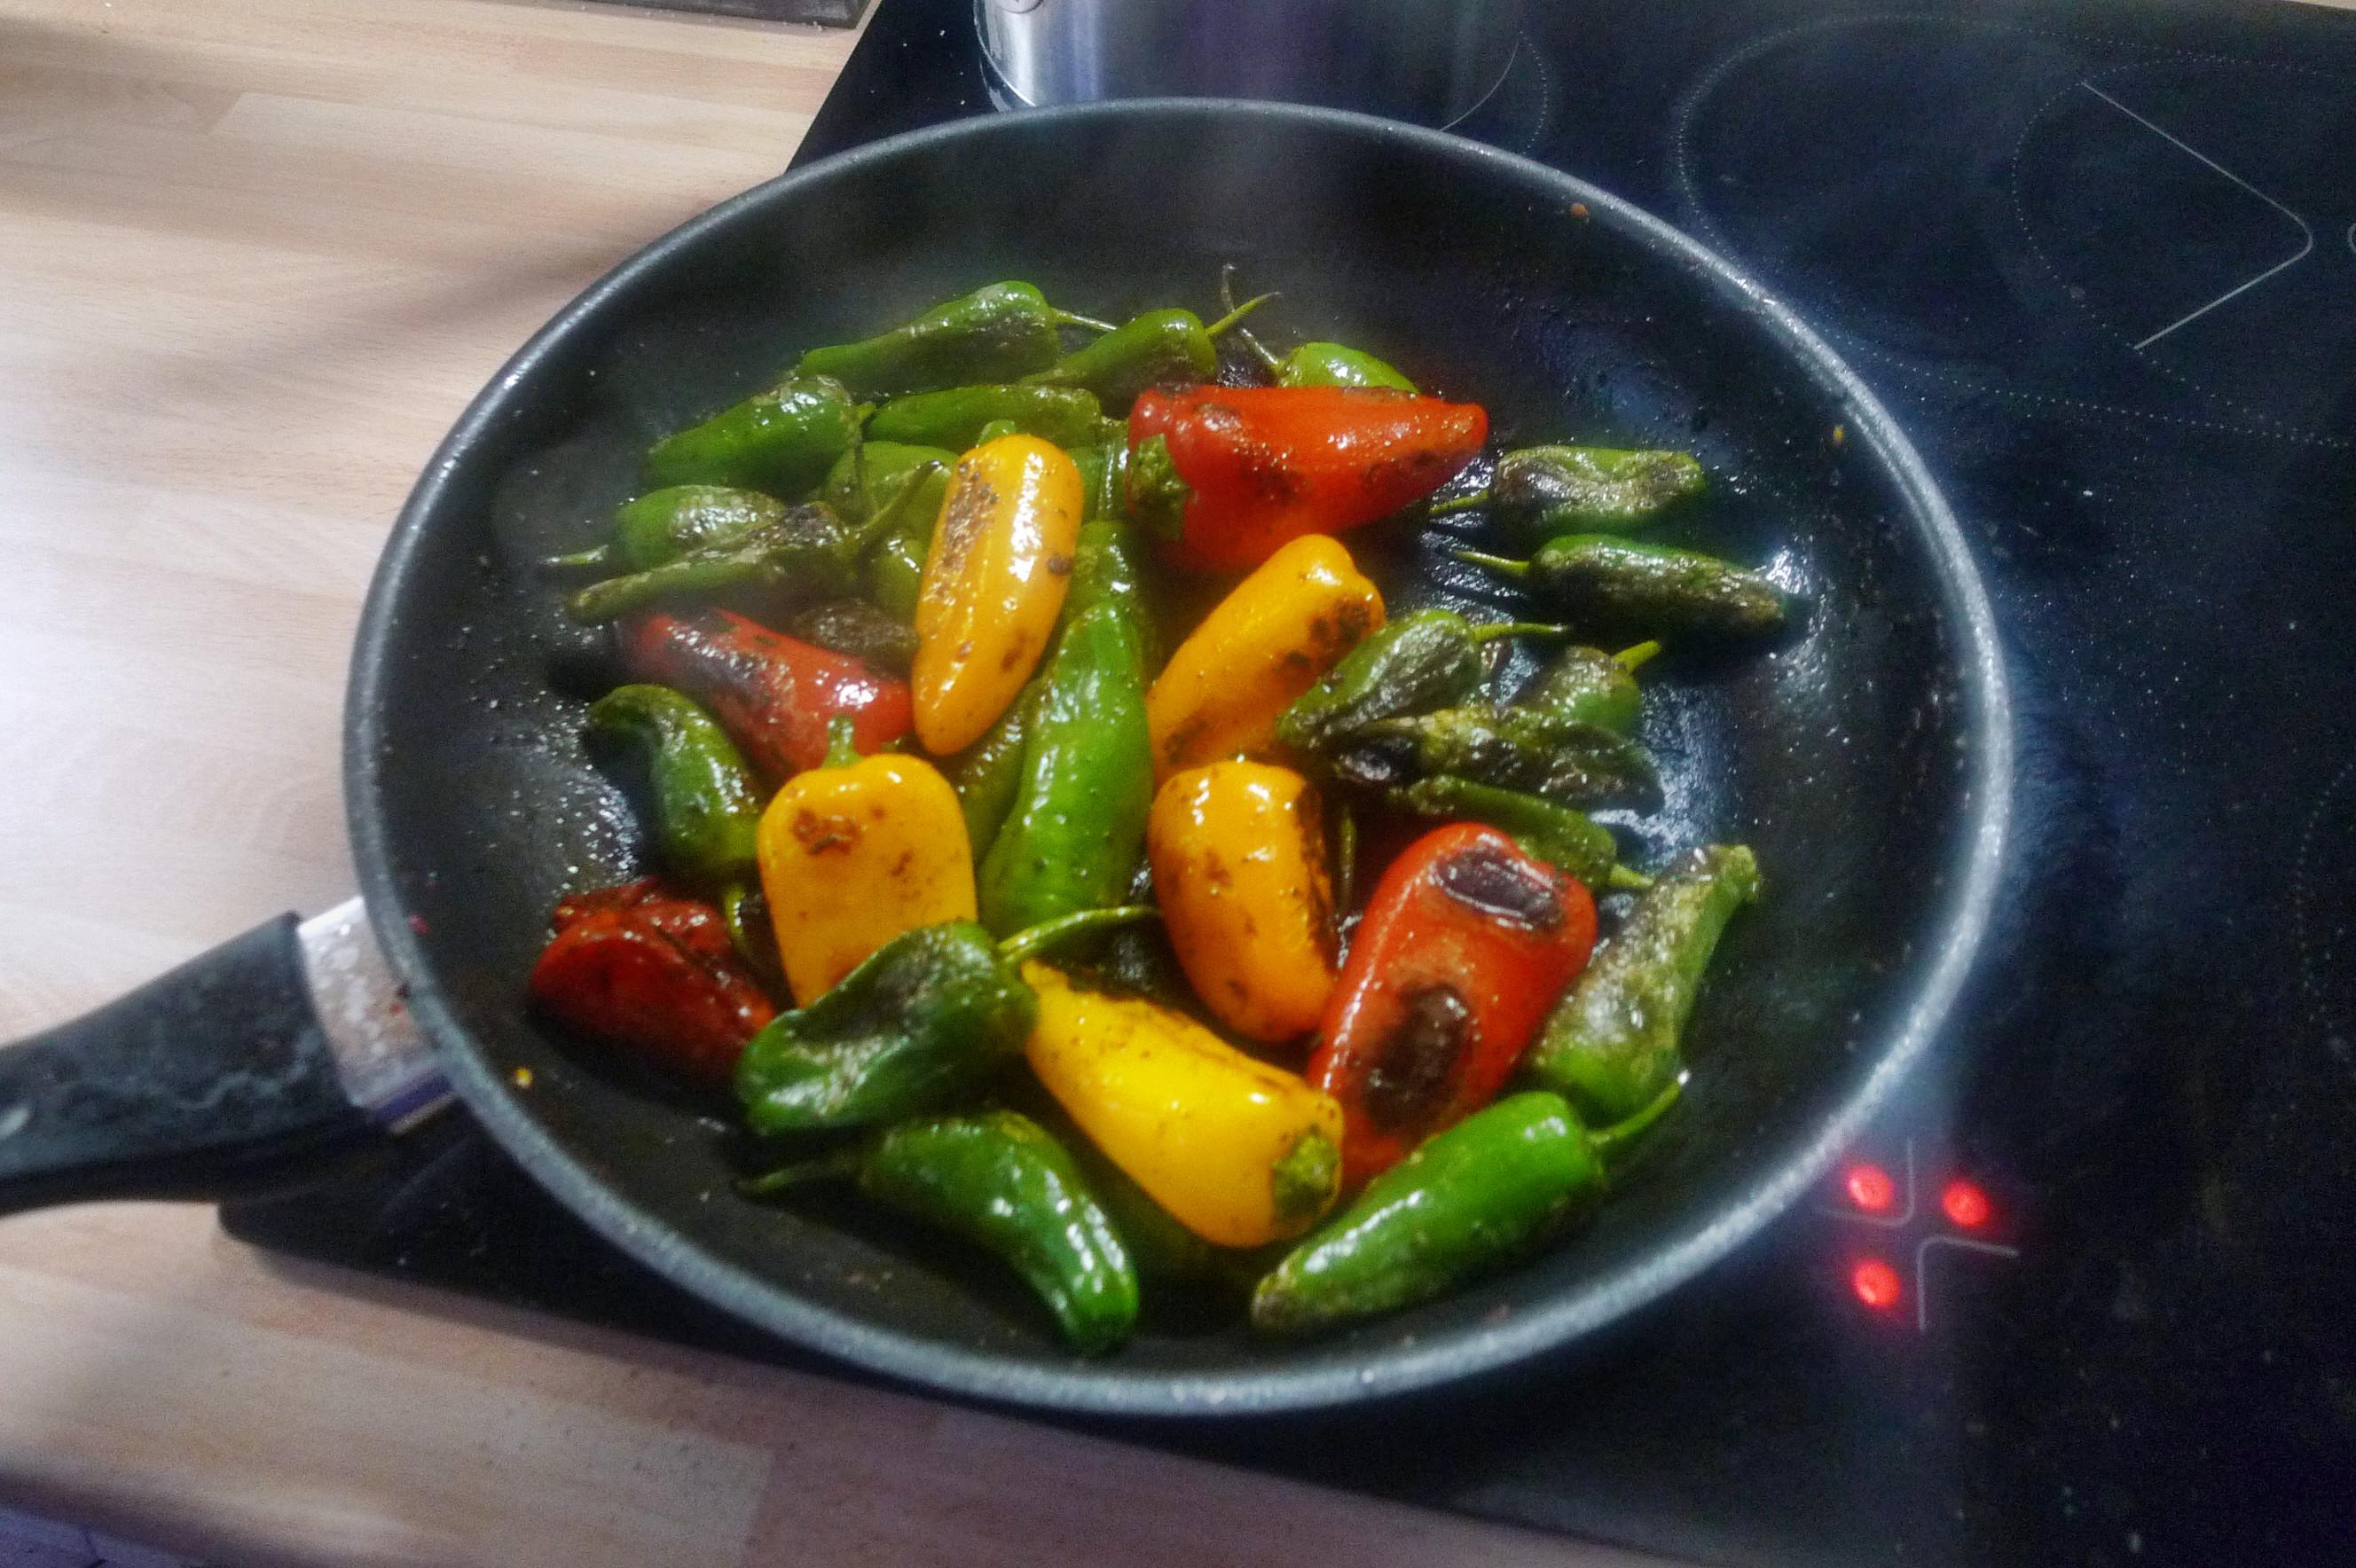 Pimentos-Paprika-Kartoffel-Salat-Buttermilch- 28.9.14   (7)